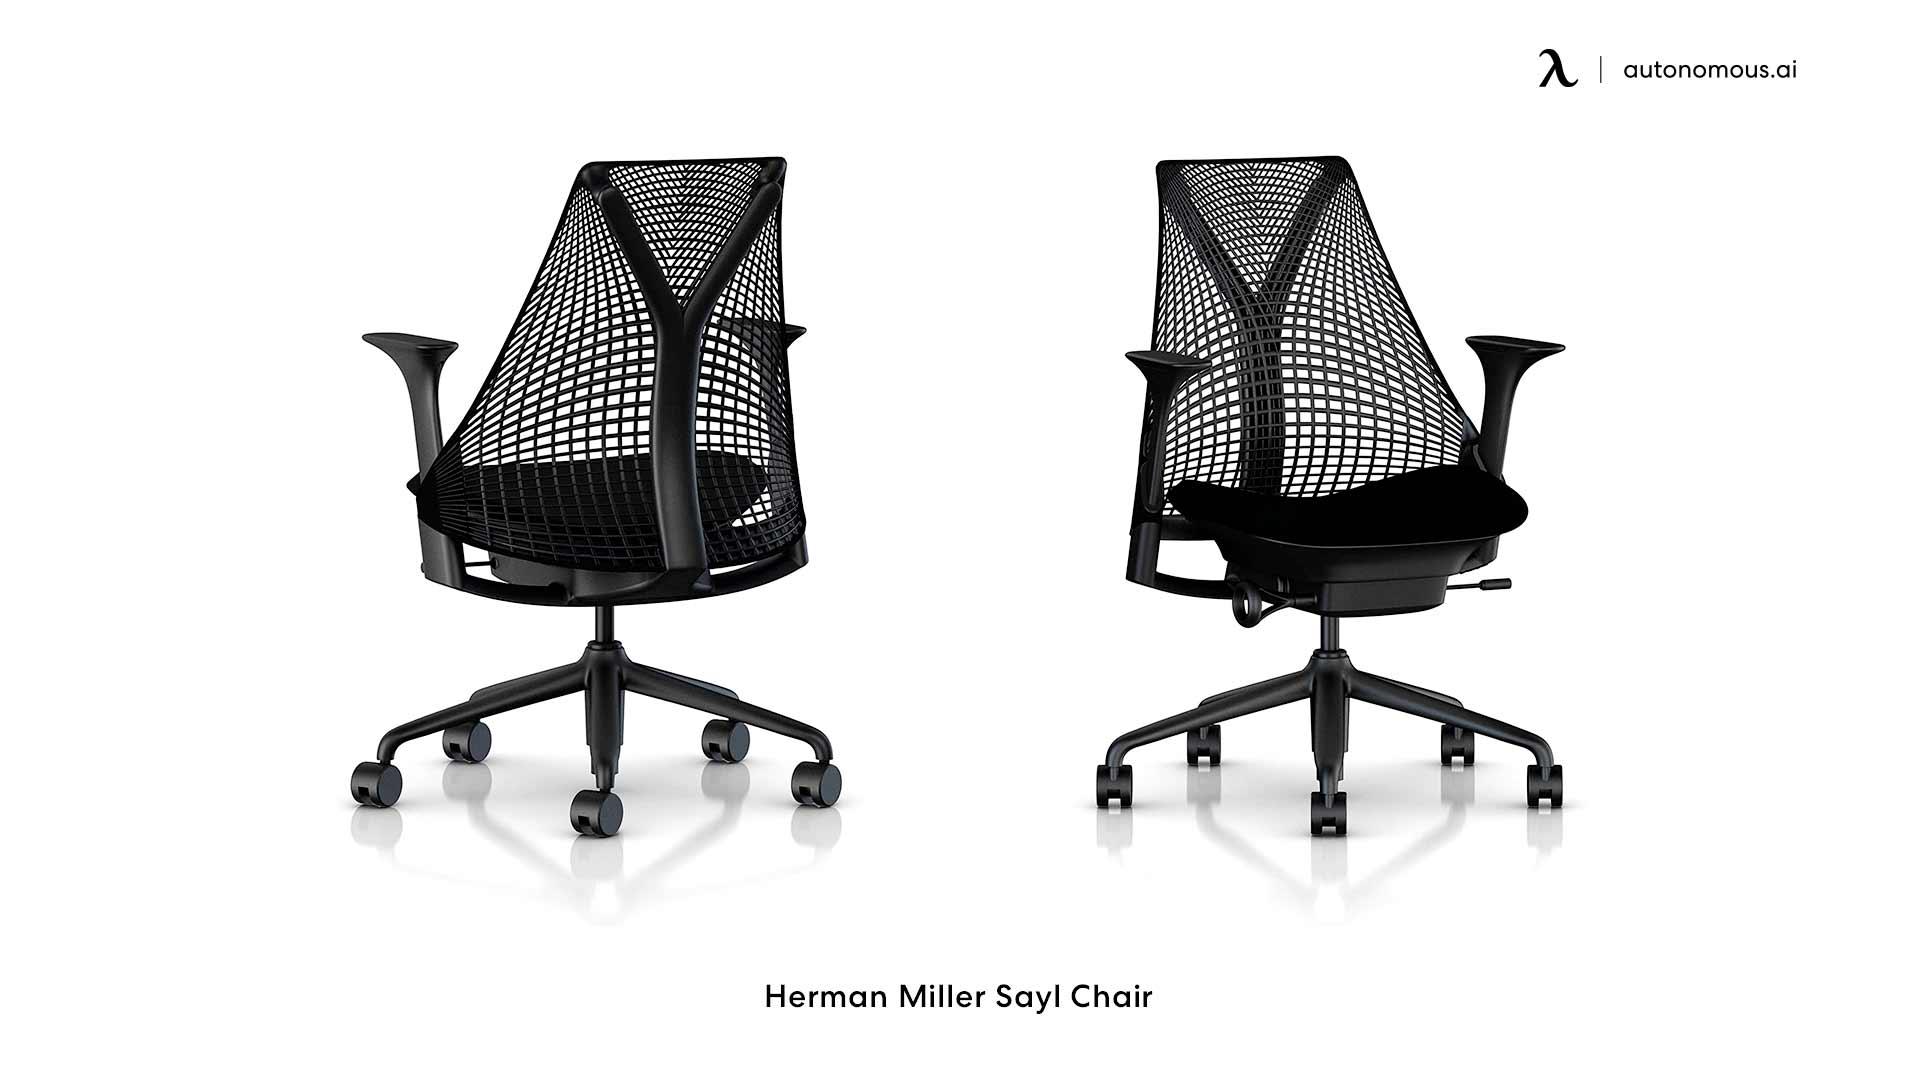 Herman Miller Sayl